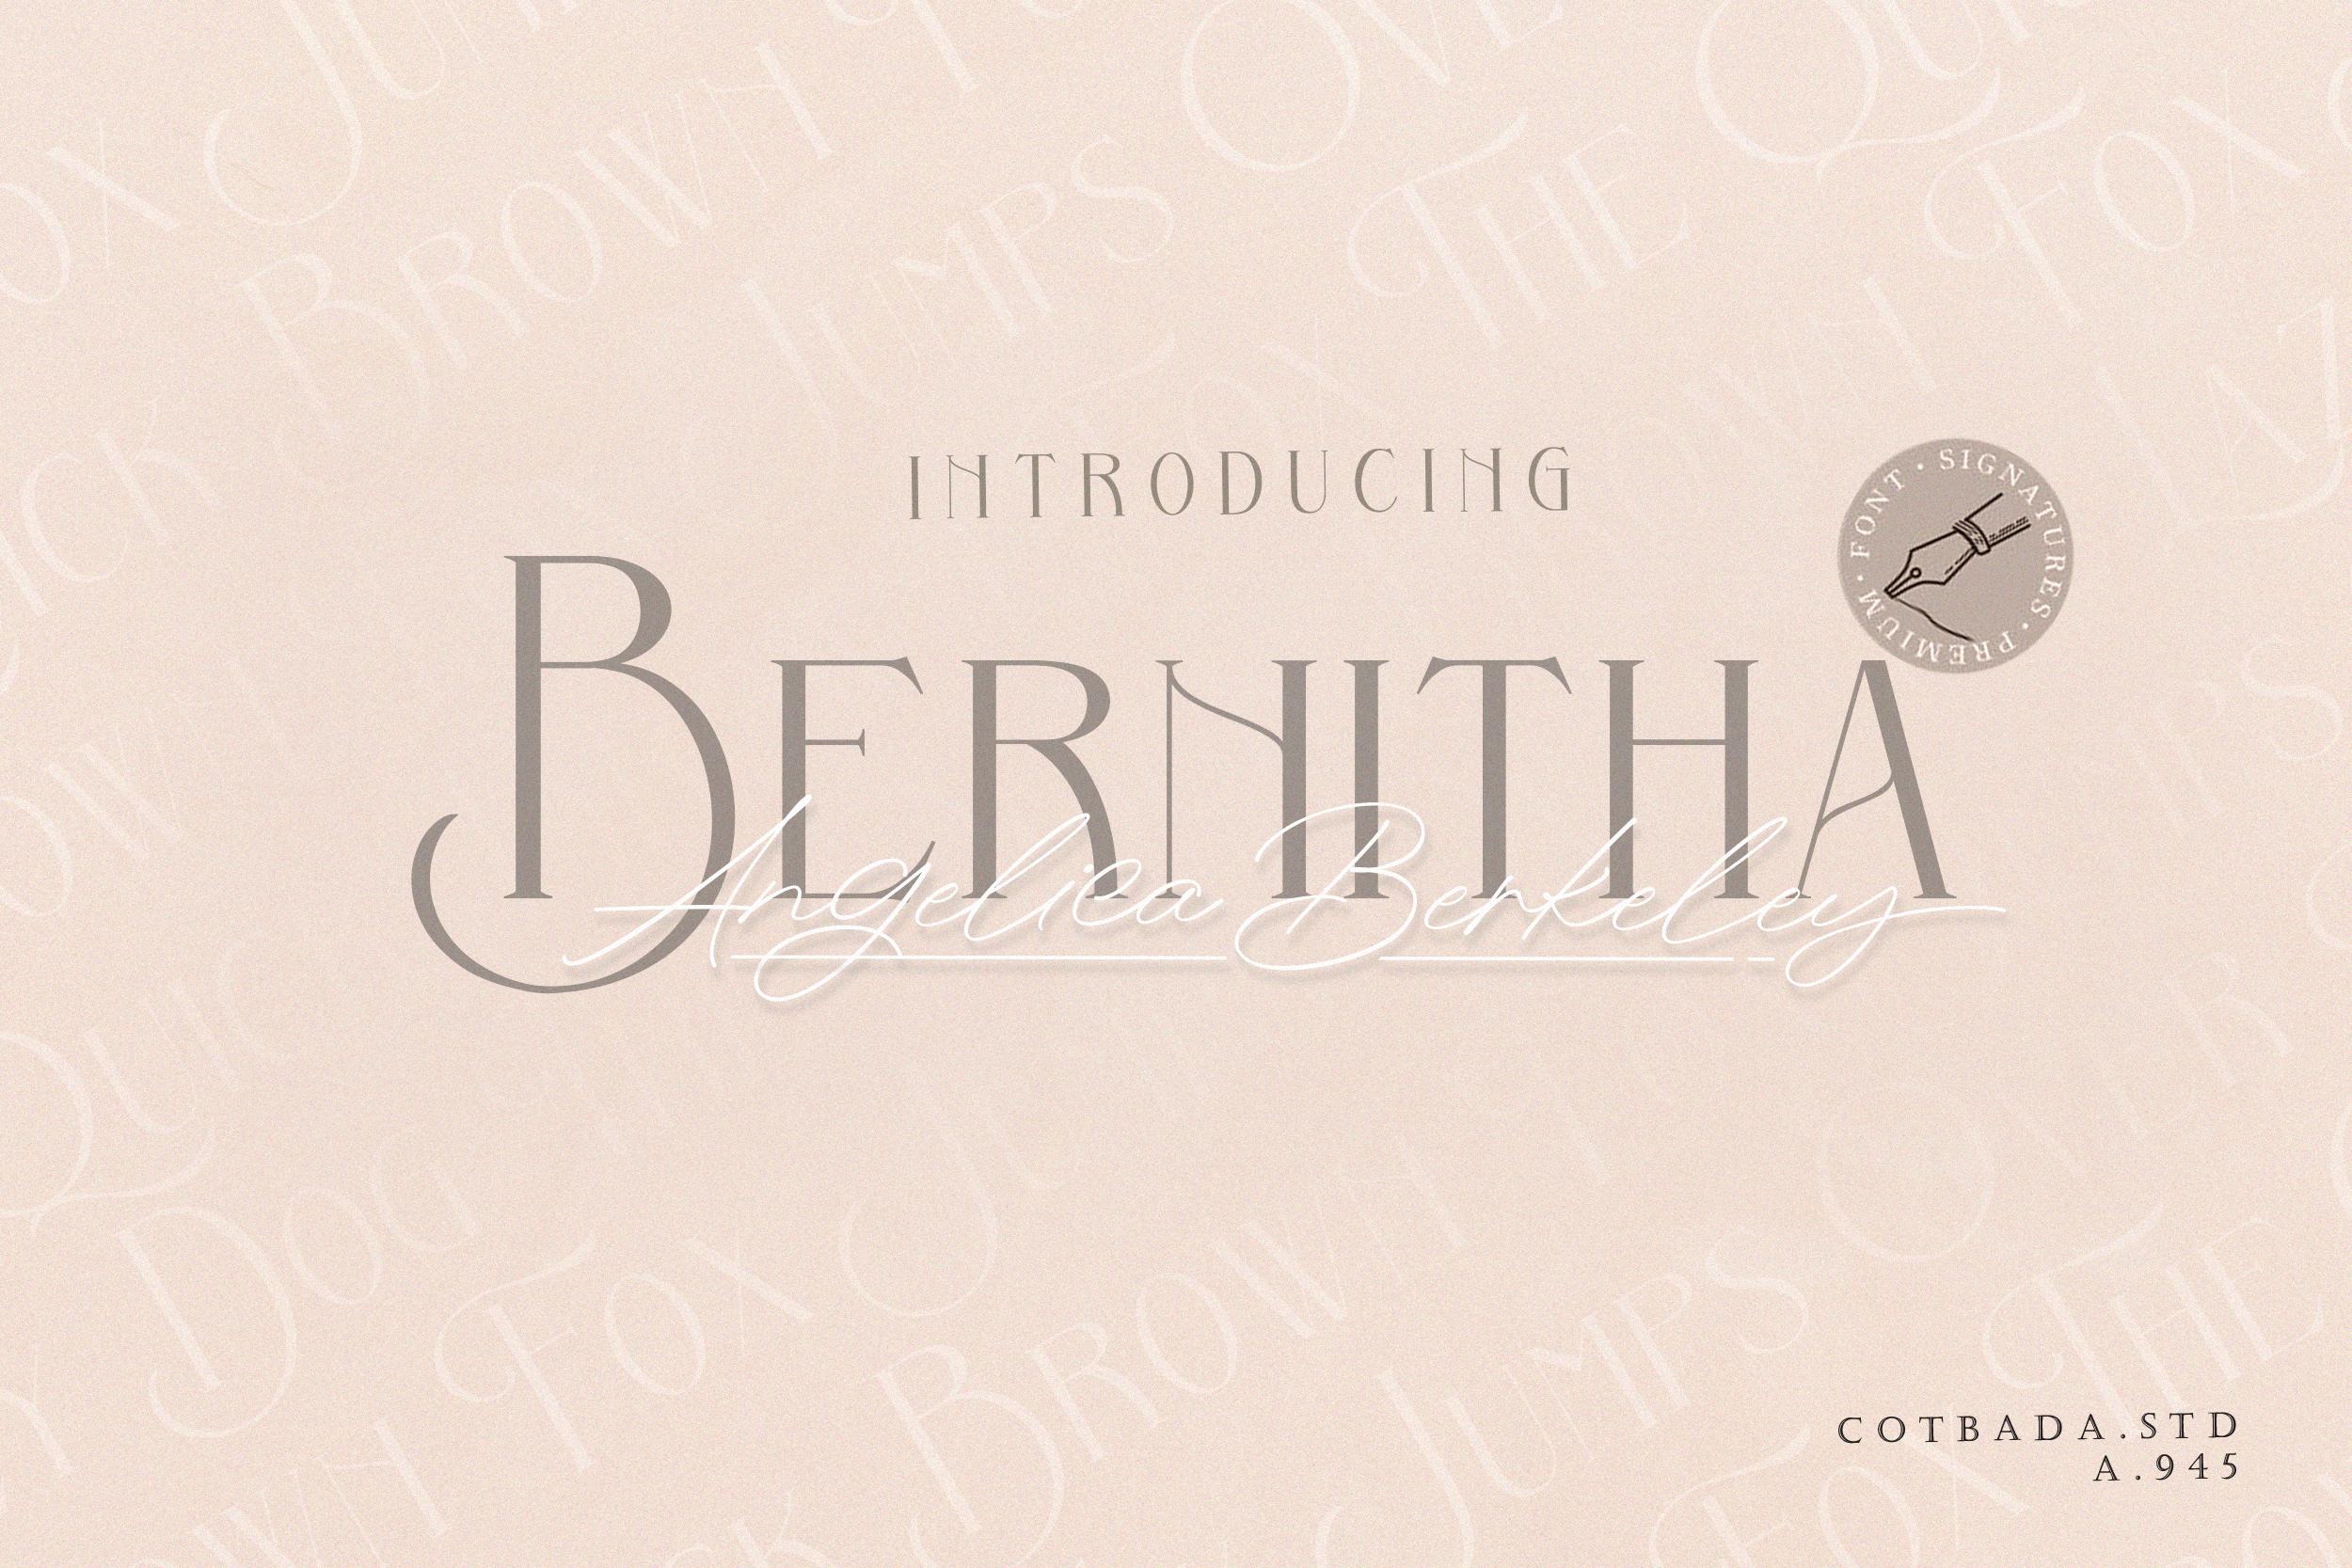 Bernitha Angelica Berkeley DUO FONT example image 1